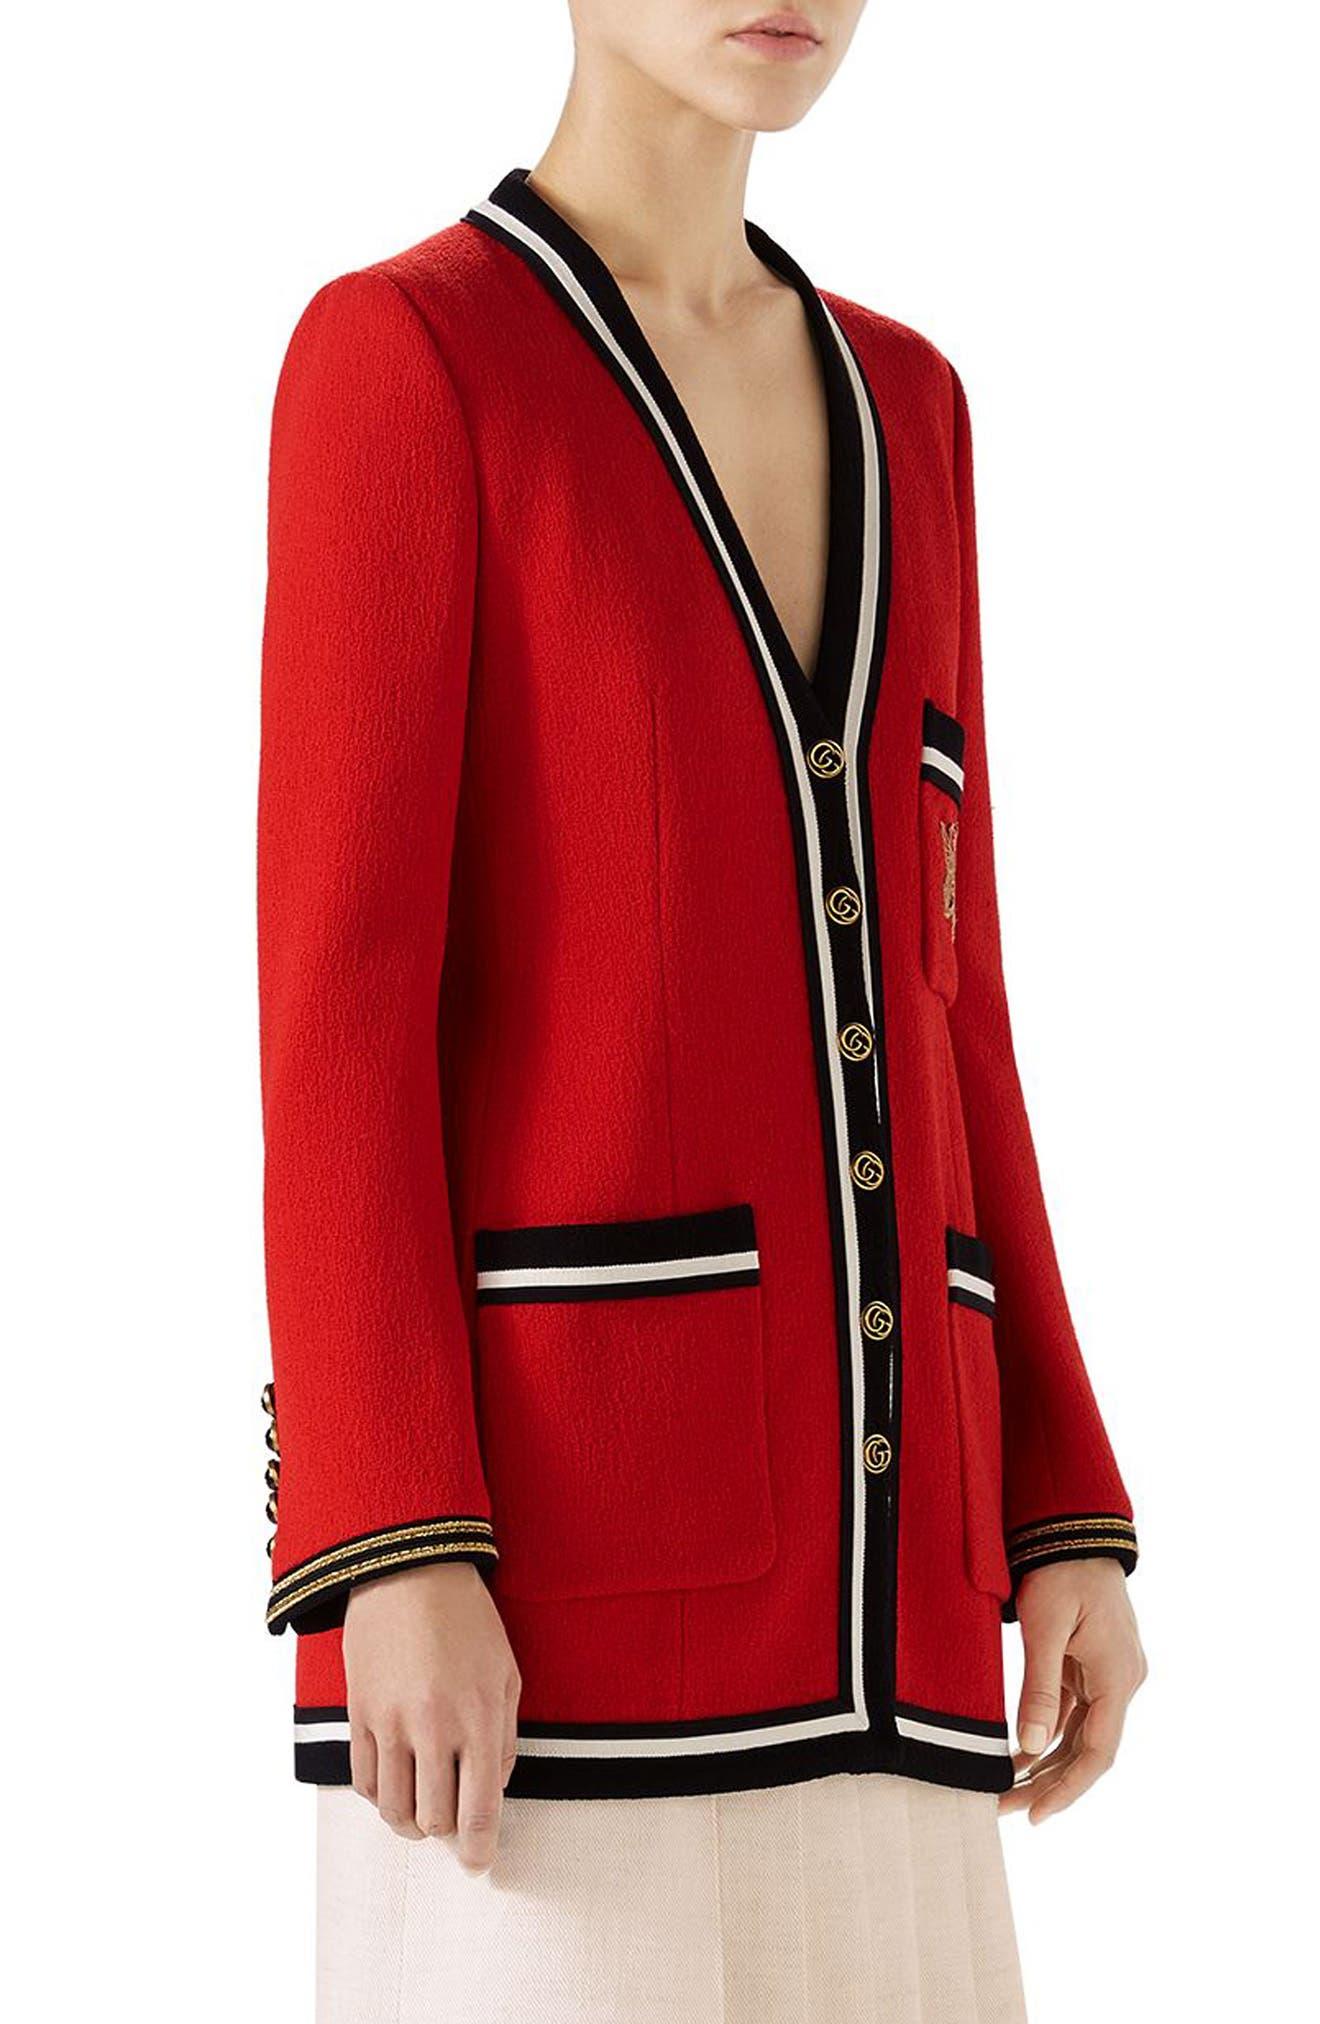 Wool Sable Long Jacket,                             Alternate thumbnail 3, color,                             Renaissance Red/ Multicolor